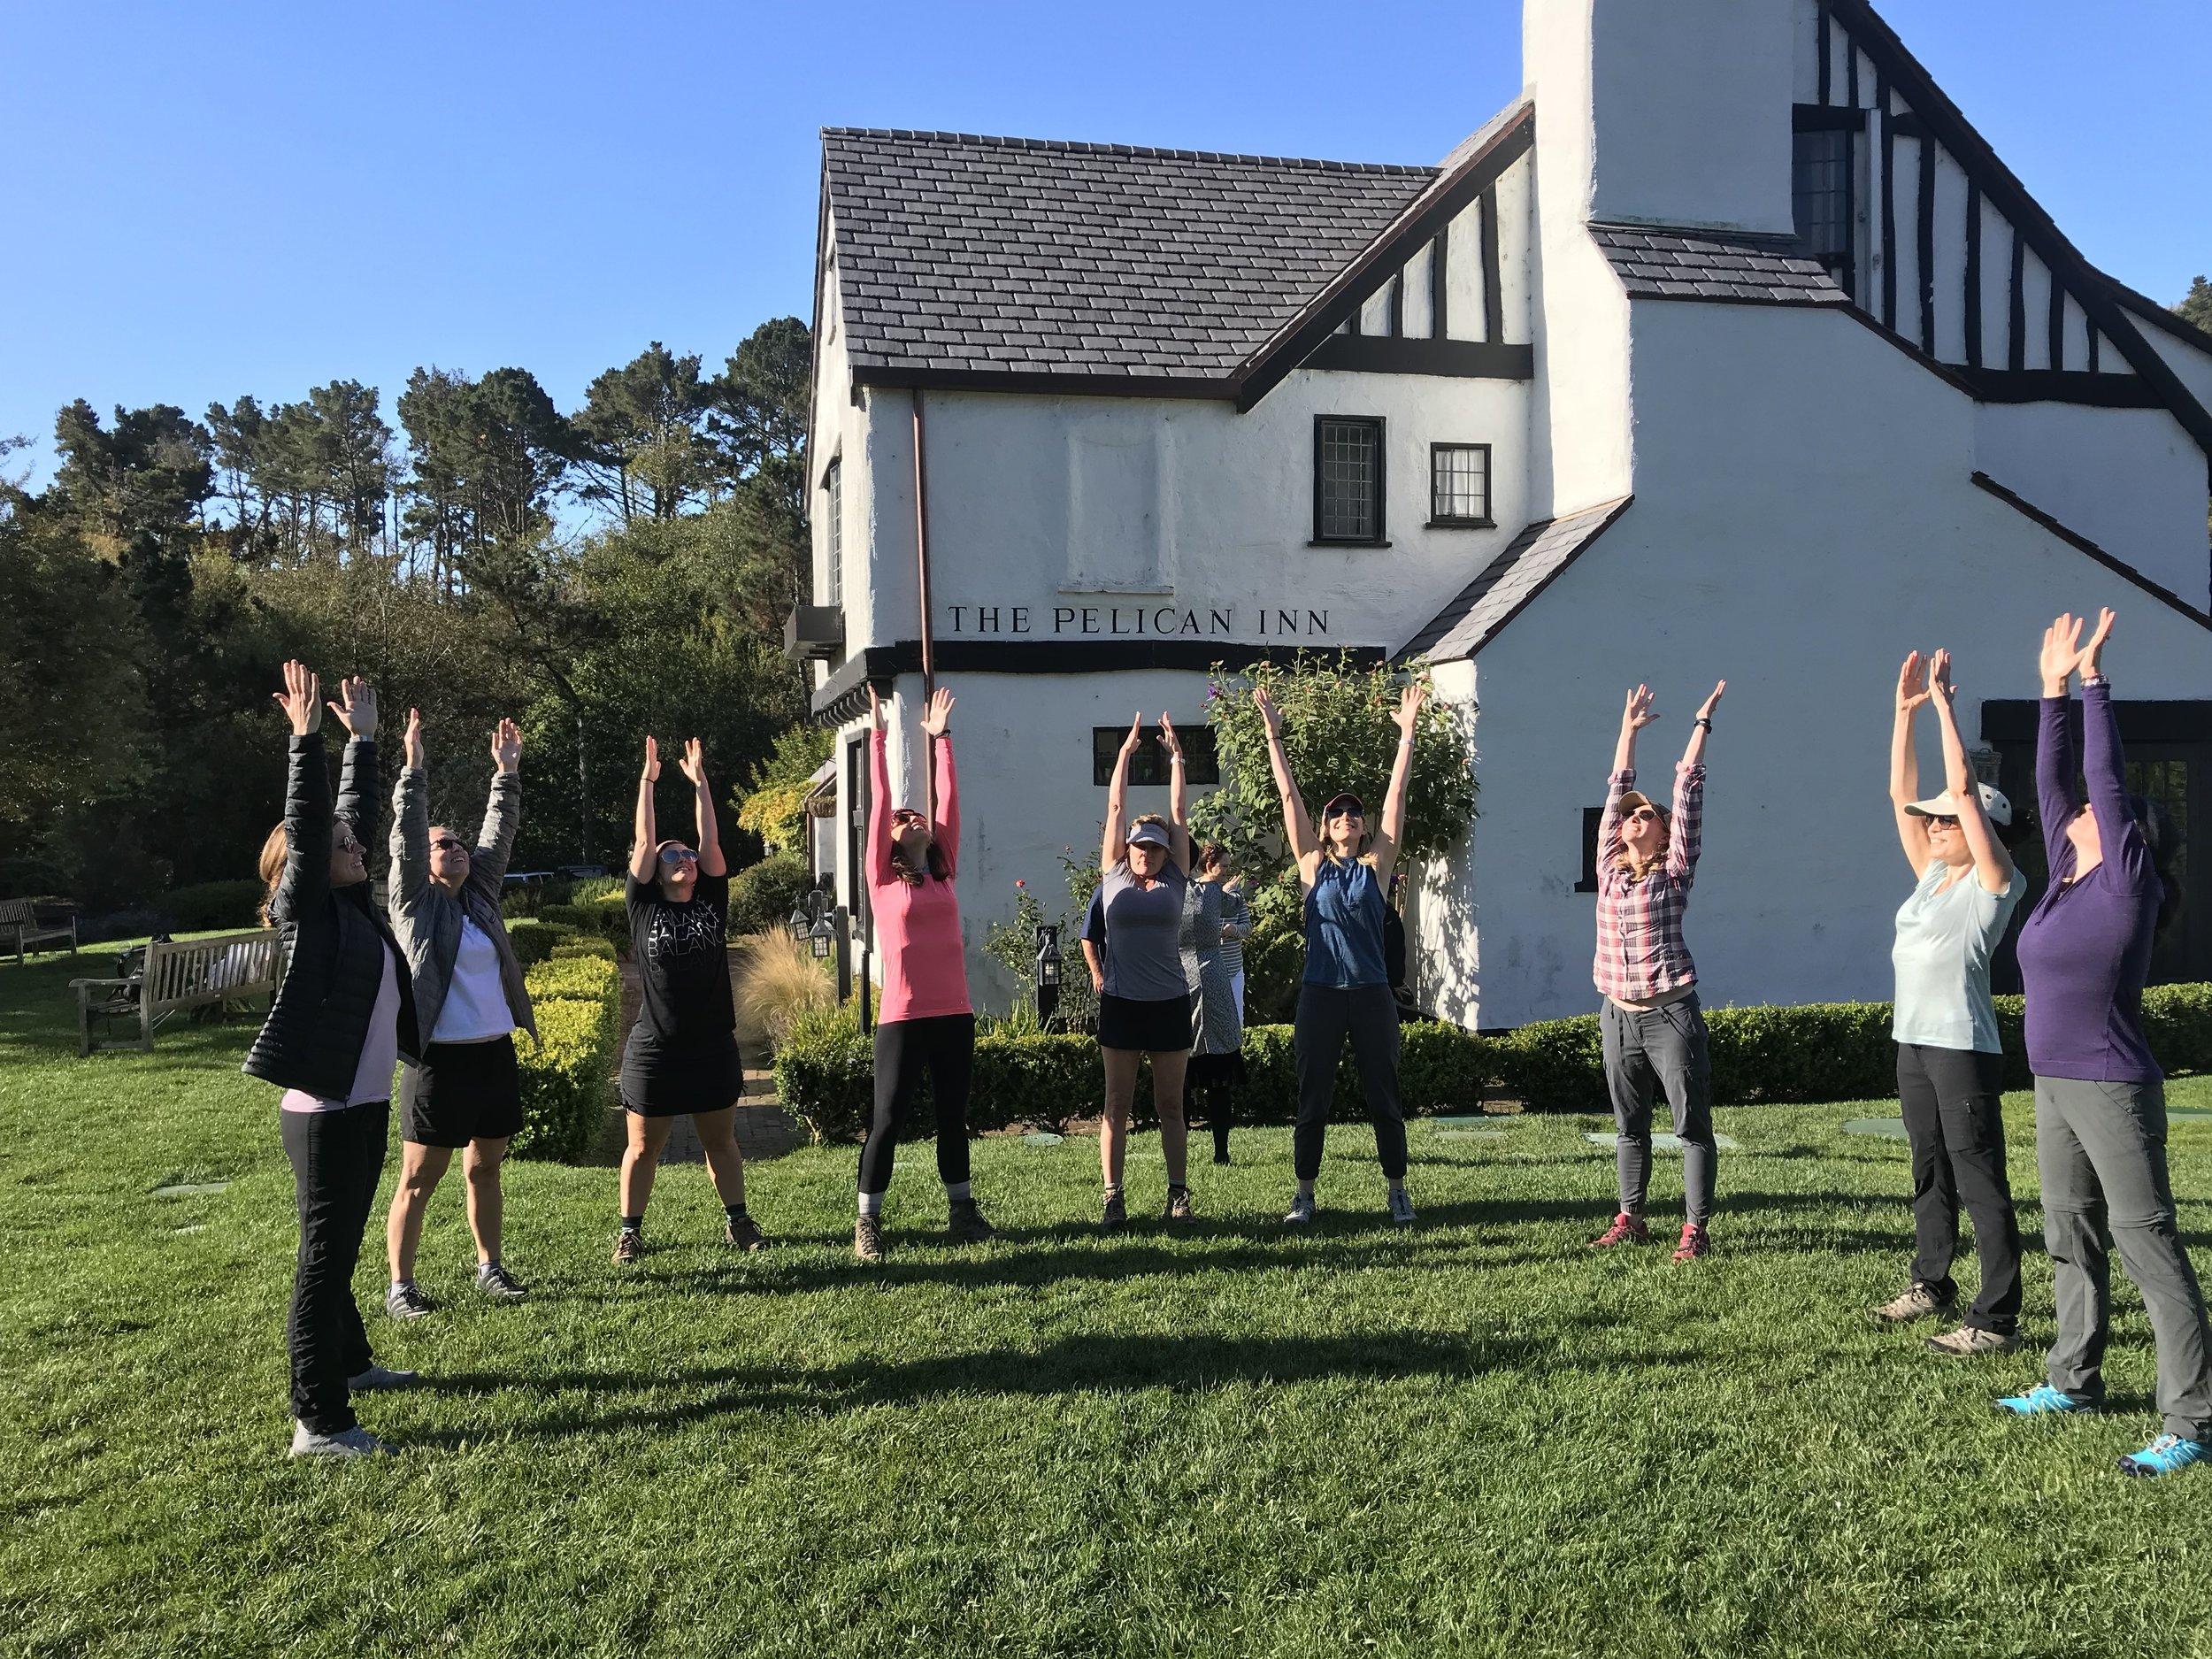 Morning yoga at Pelican Inn